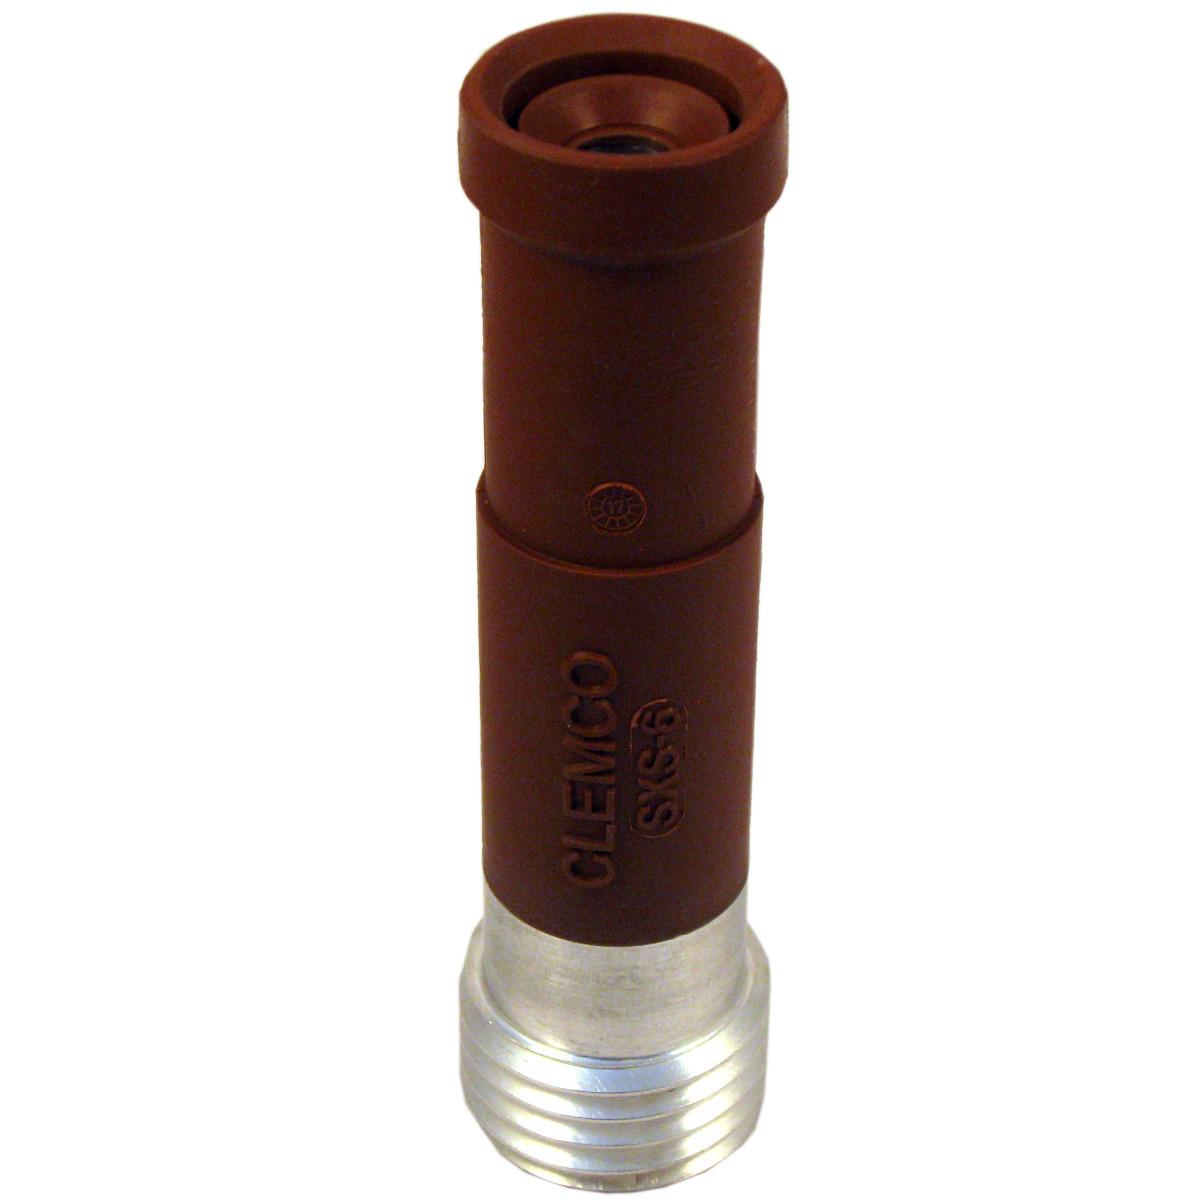 Brúsna tryska CLEMCO SXS-6 9,5 mm NOVINKA